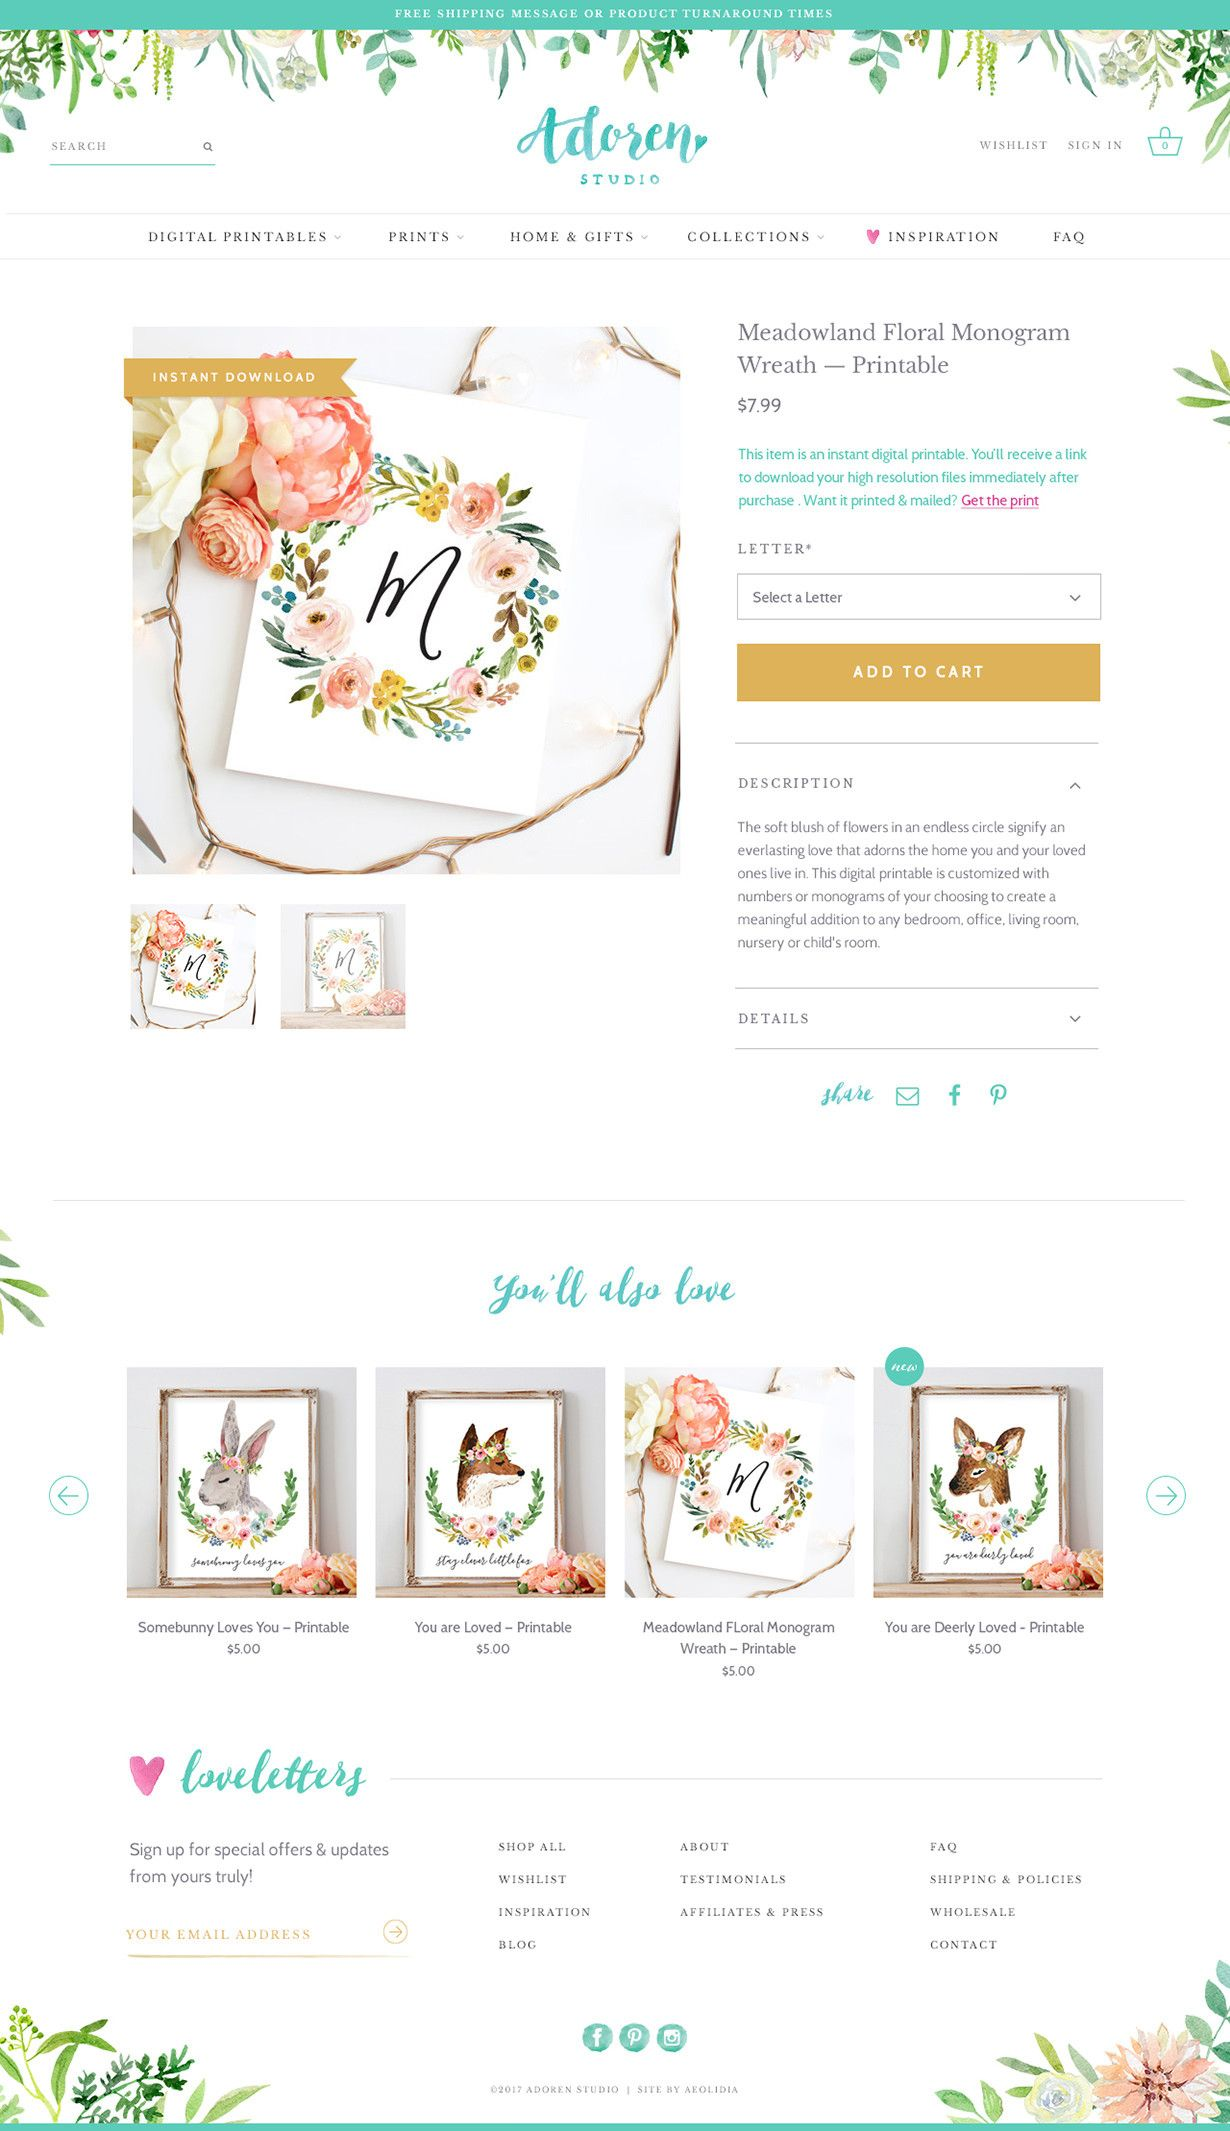 Shopify Website Design and Branding Case Study: Adoren Studio